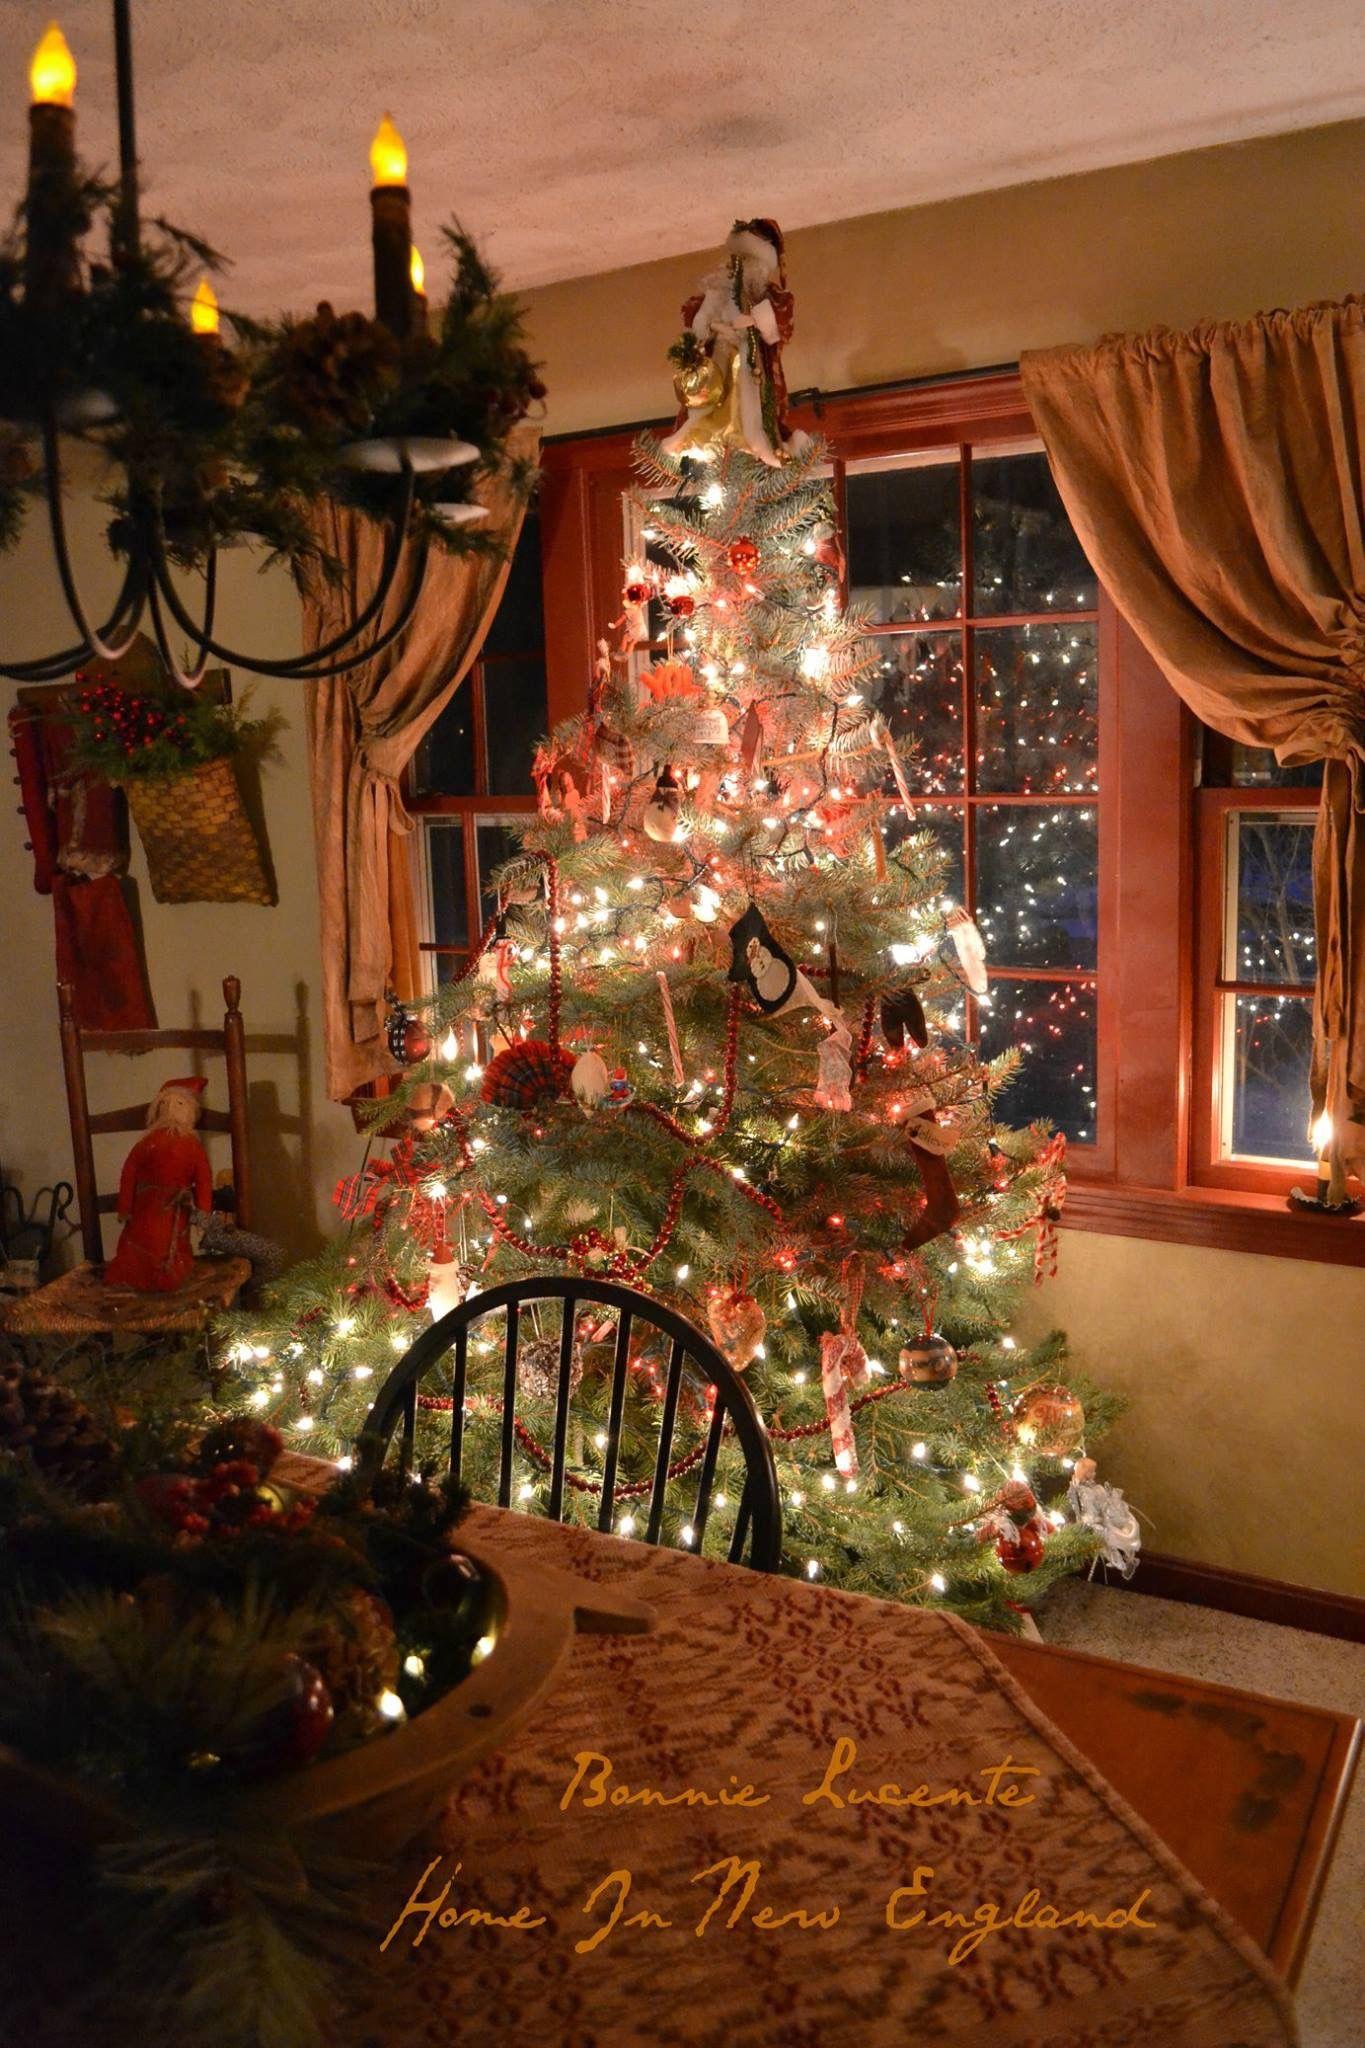 Image by Robin MacKay on Primitives Christmas tree